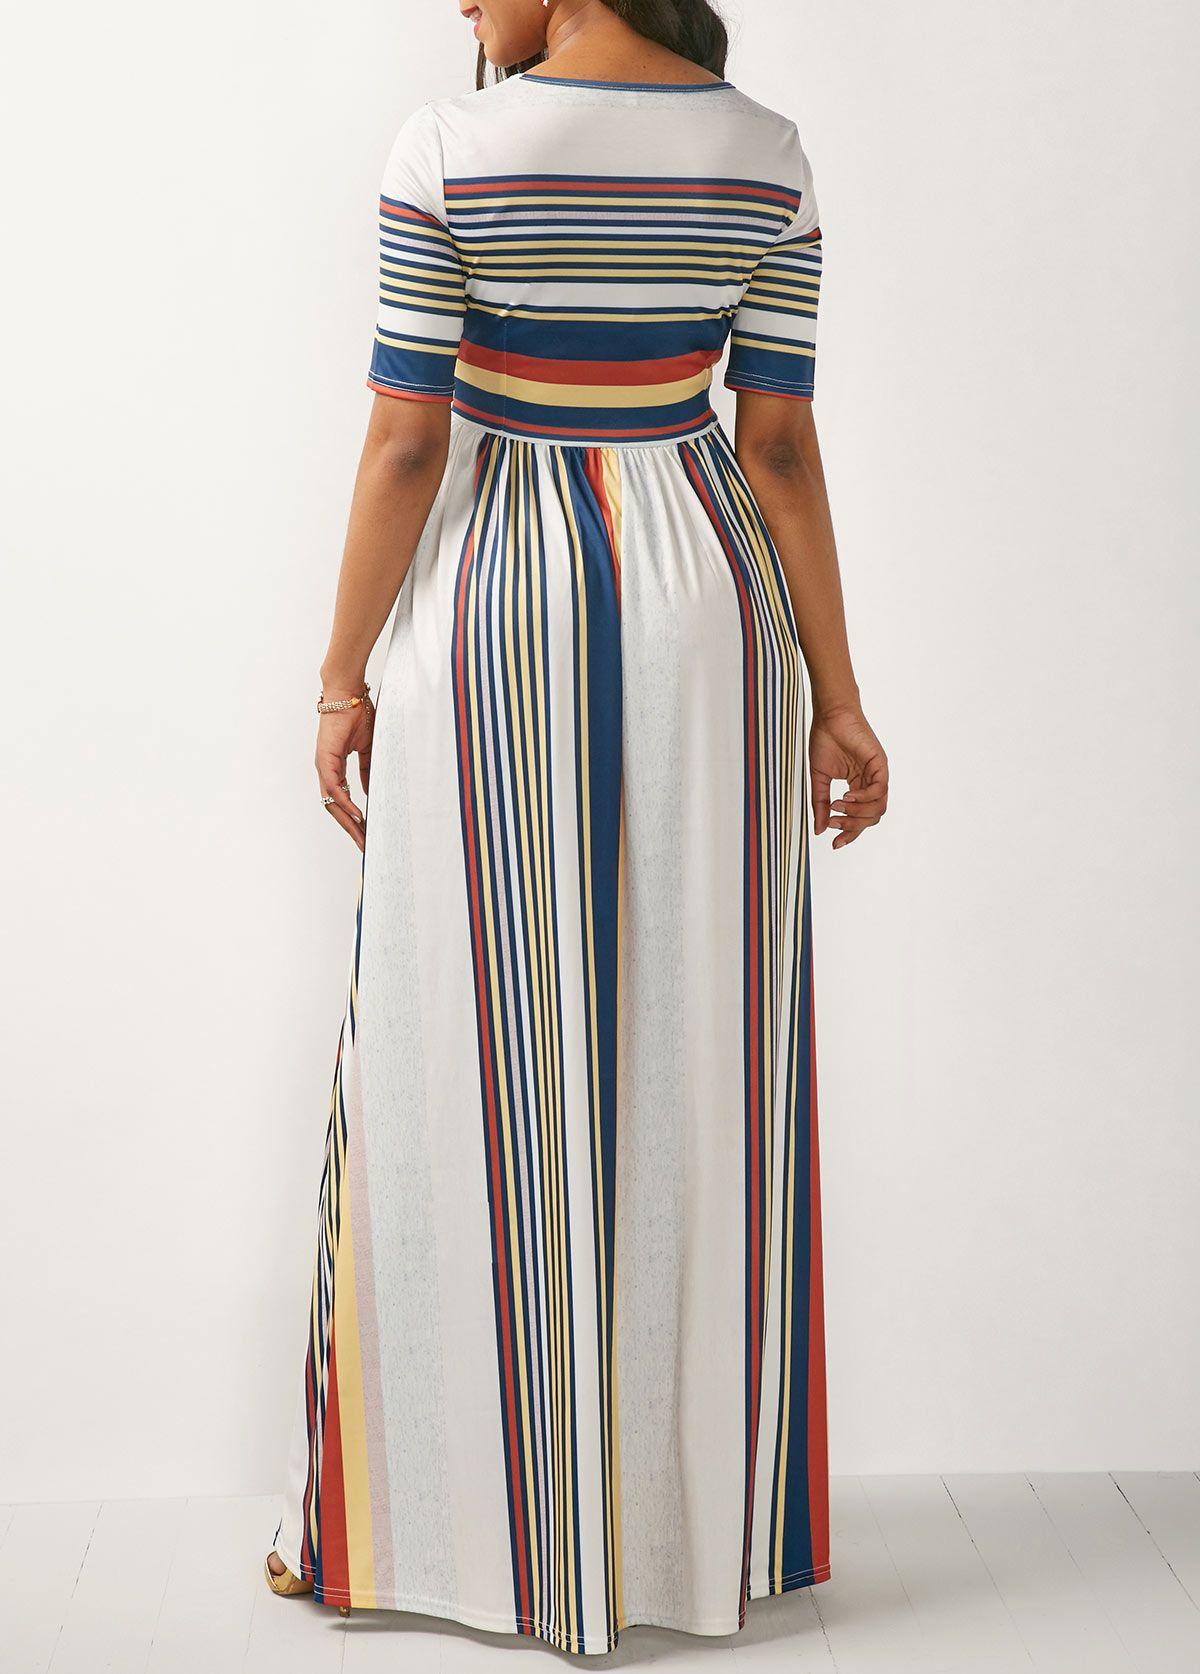 7a5c06d7d908 High Waist Stripe Print White Maxi Dress